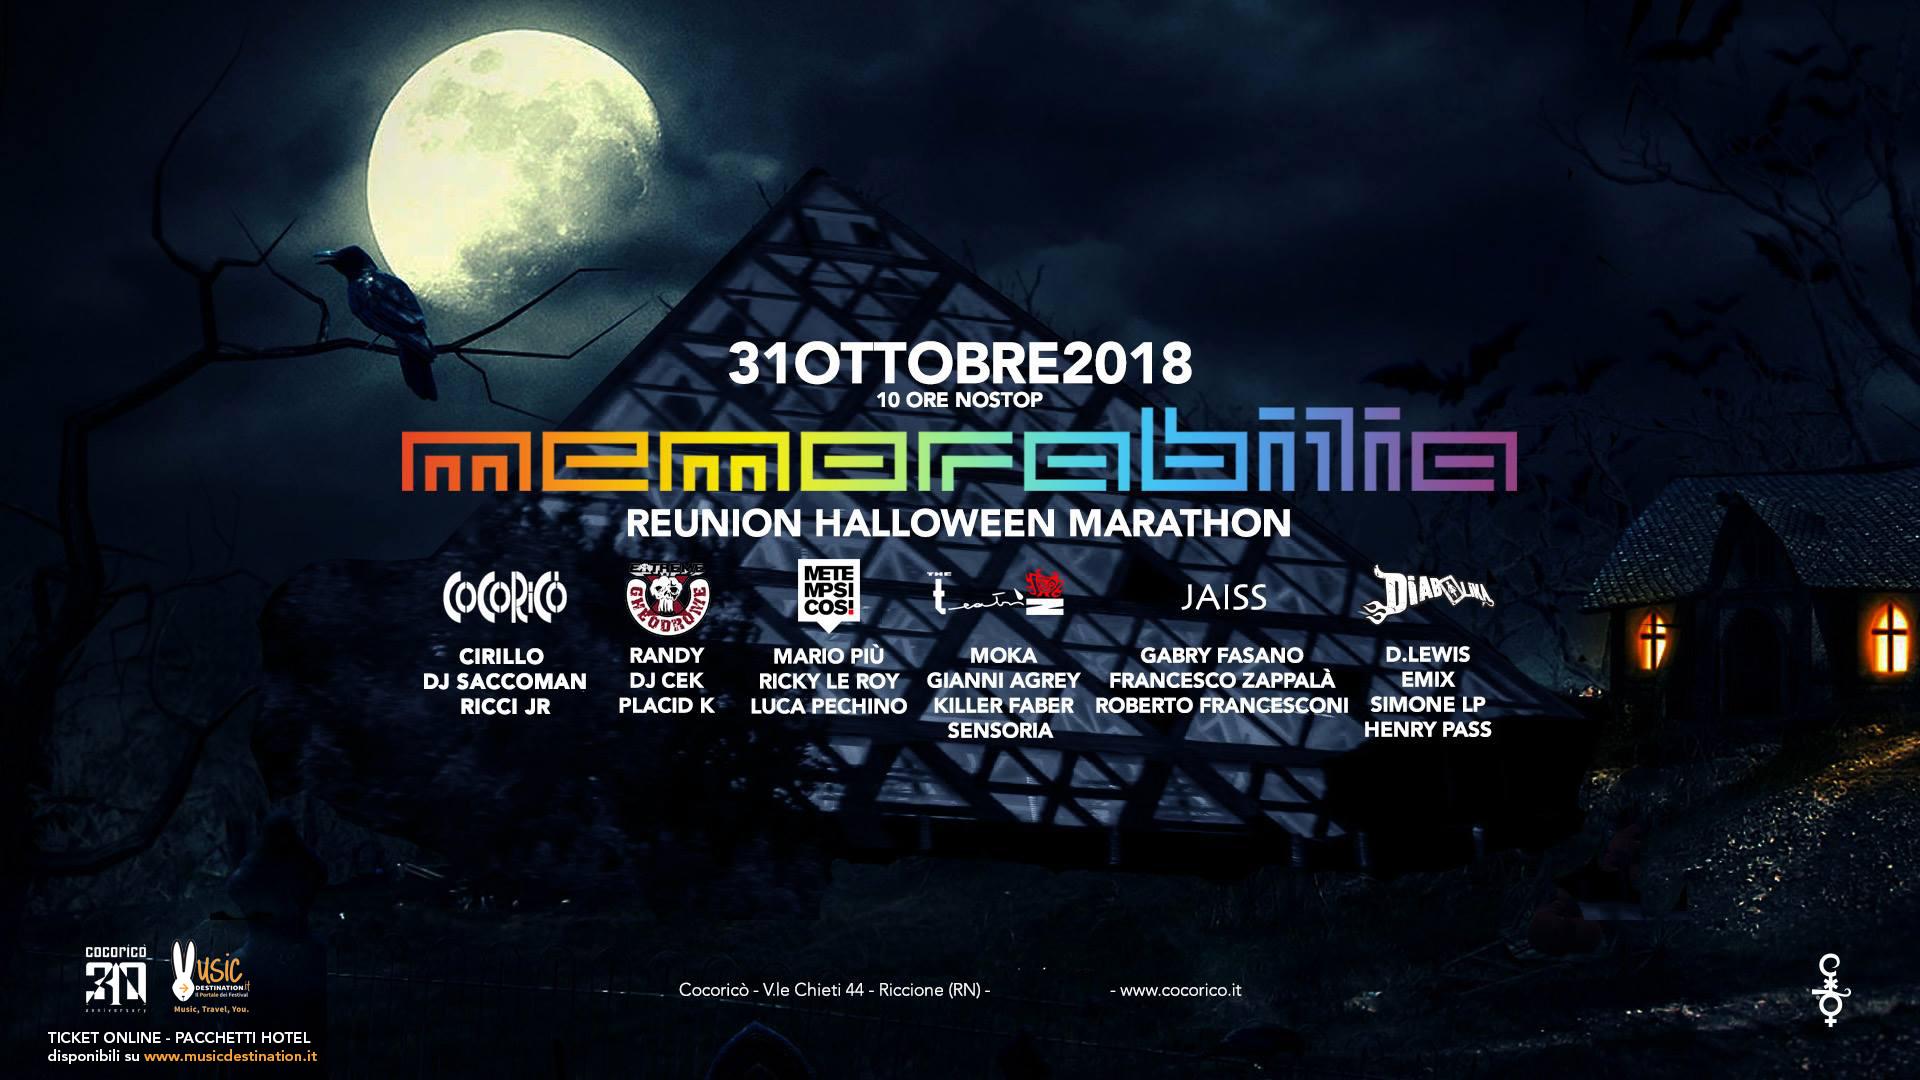 halloween cocorico 2018 memorabilia reunion